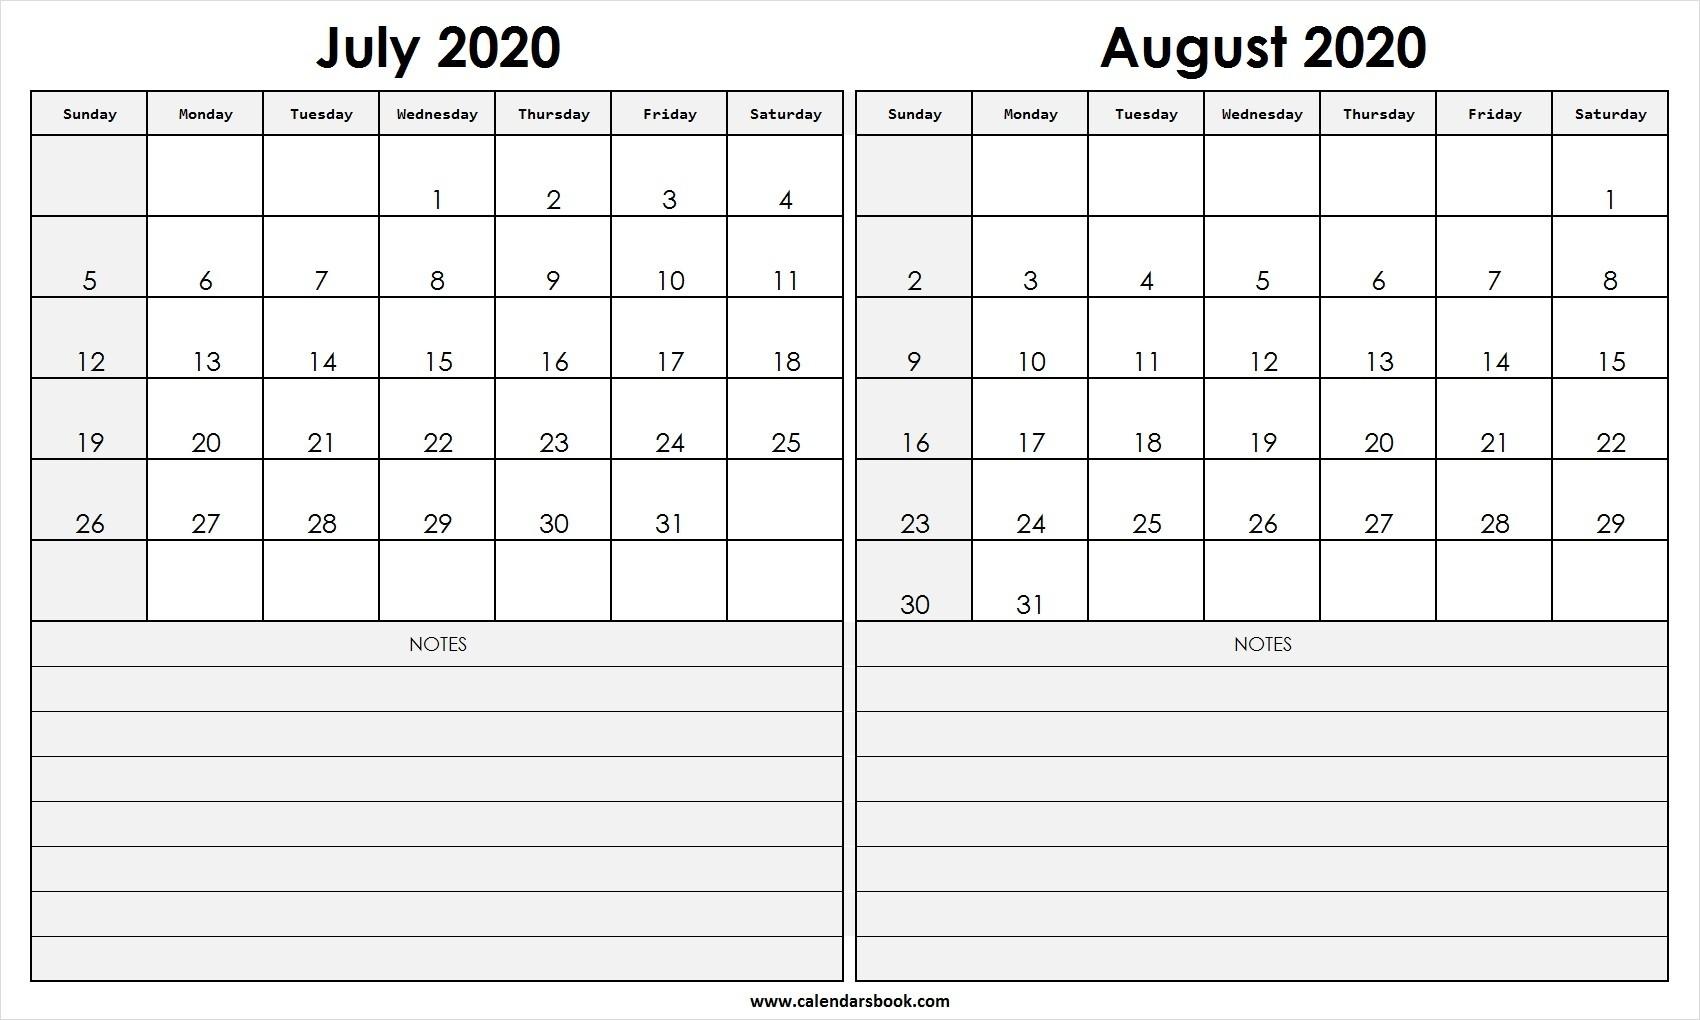 Print July August 2020 Calendar Template | 2 Month Calendar-Blank Printable Calendar July And August 2020